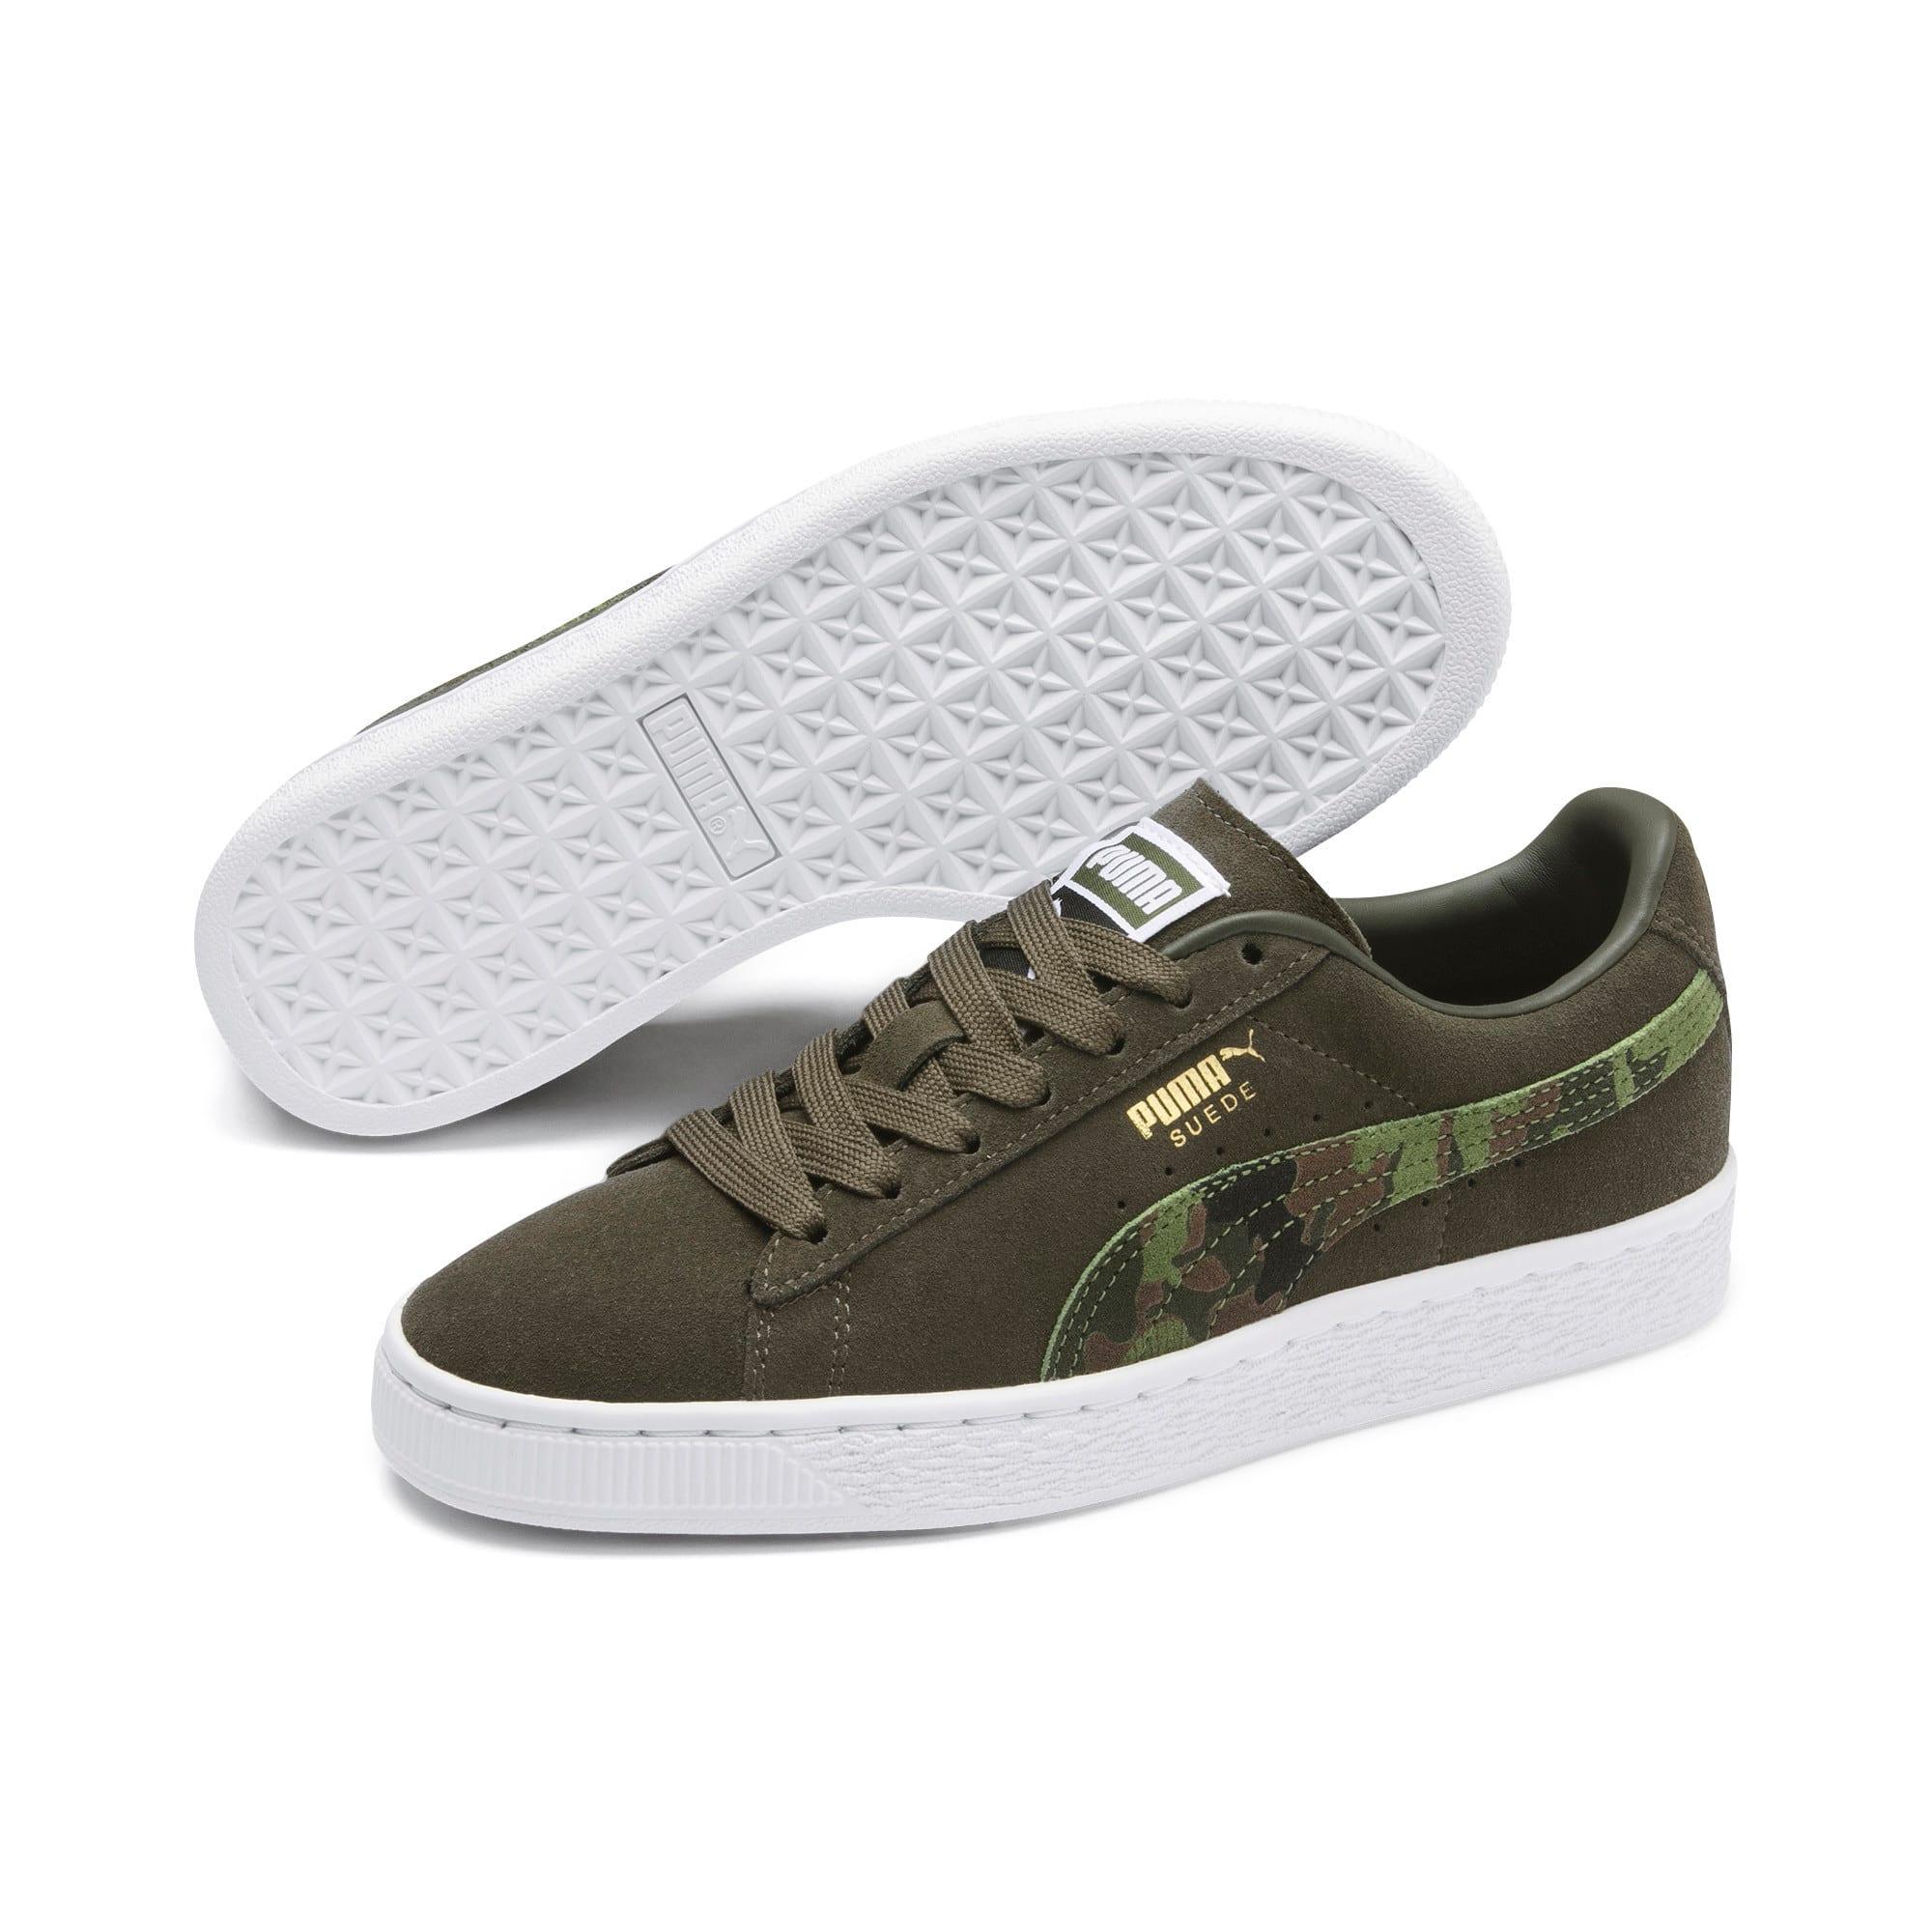 cheap for discount f4cbb 7ed5d Suede Classic Ambush Sneakers JR